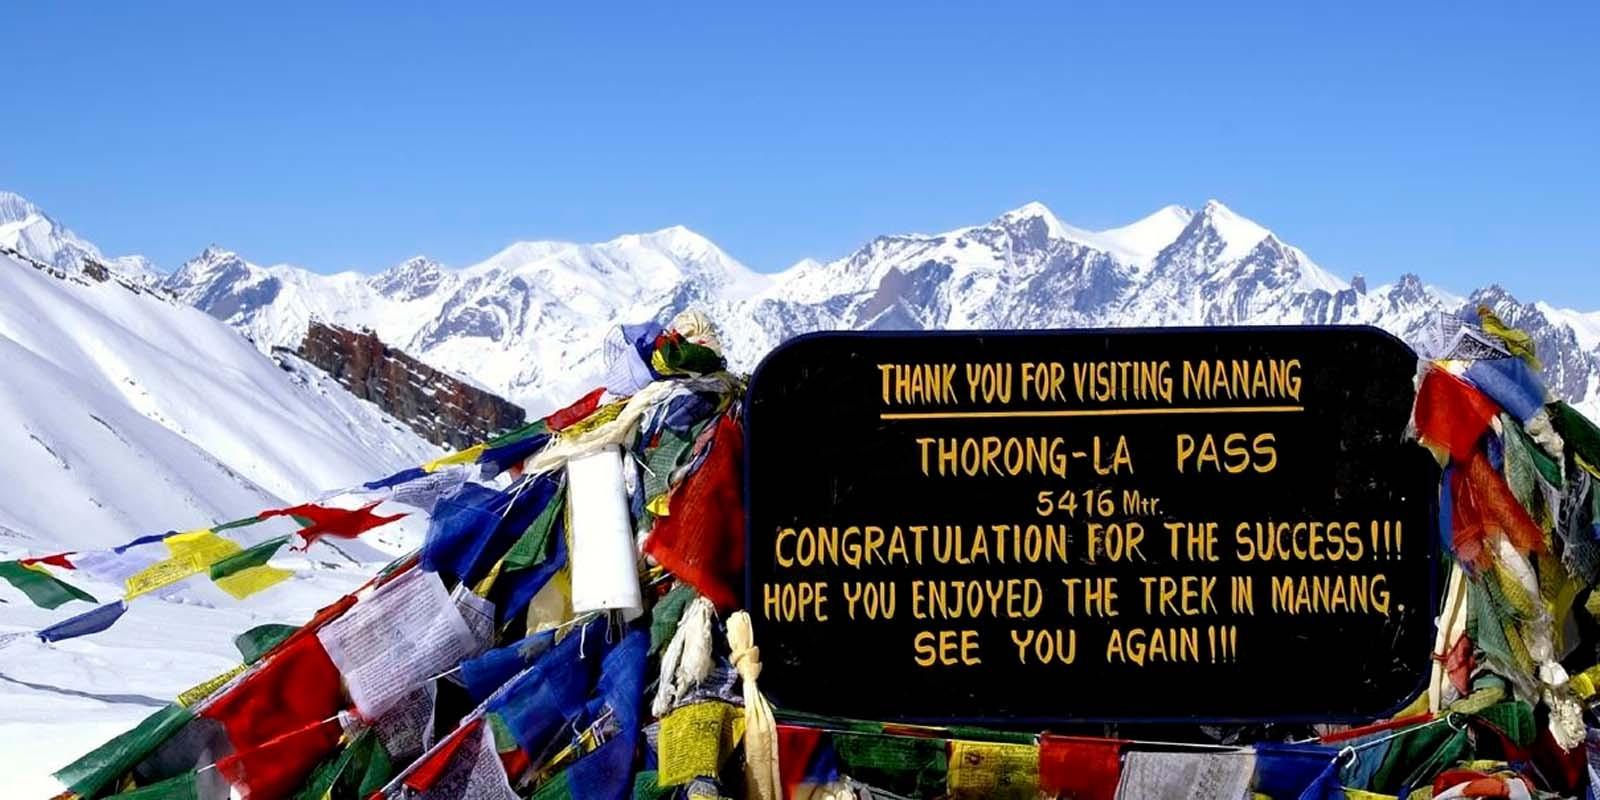 Thorang La Pass in Annapurna Region